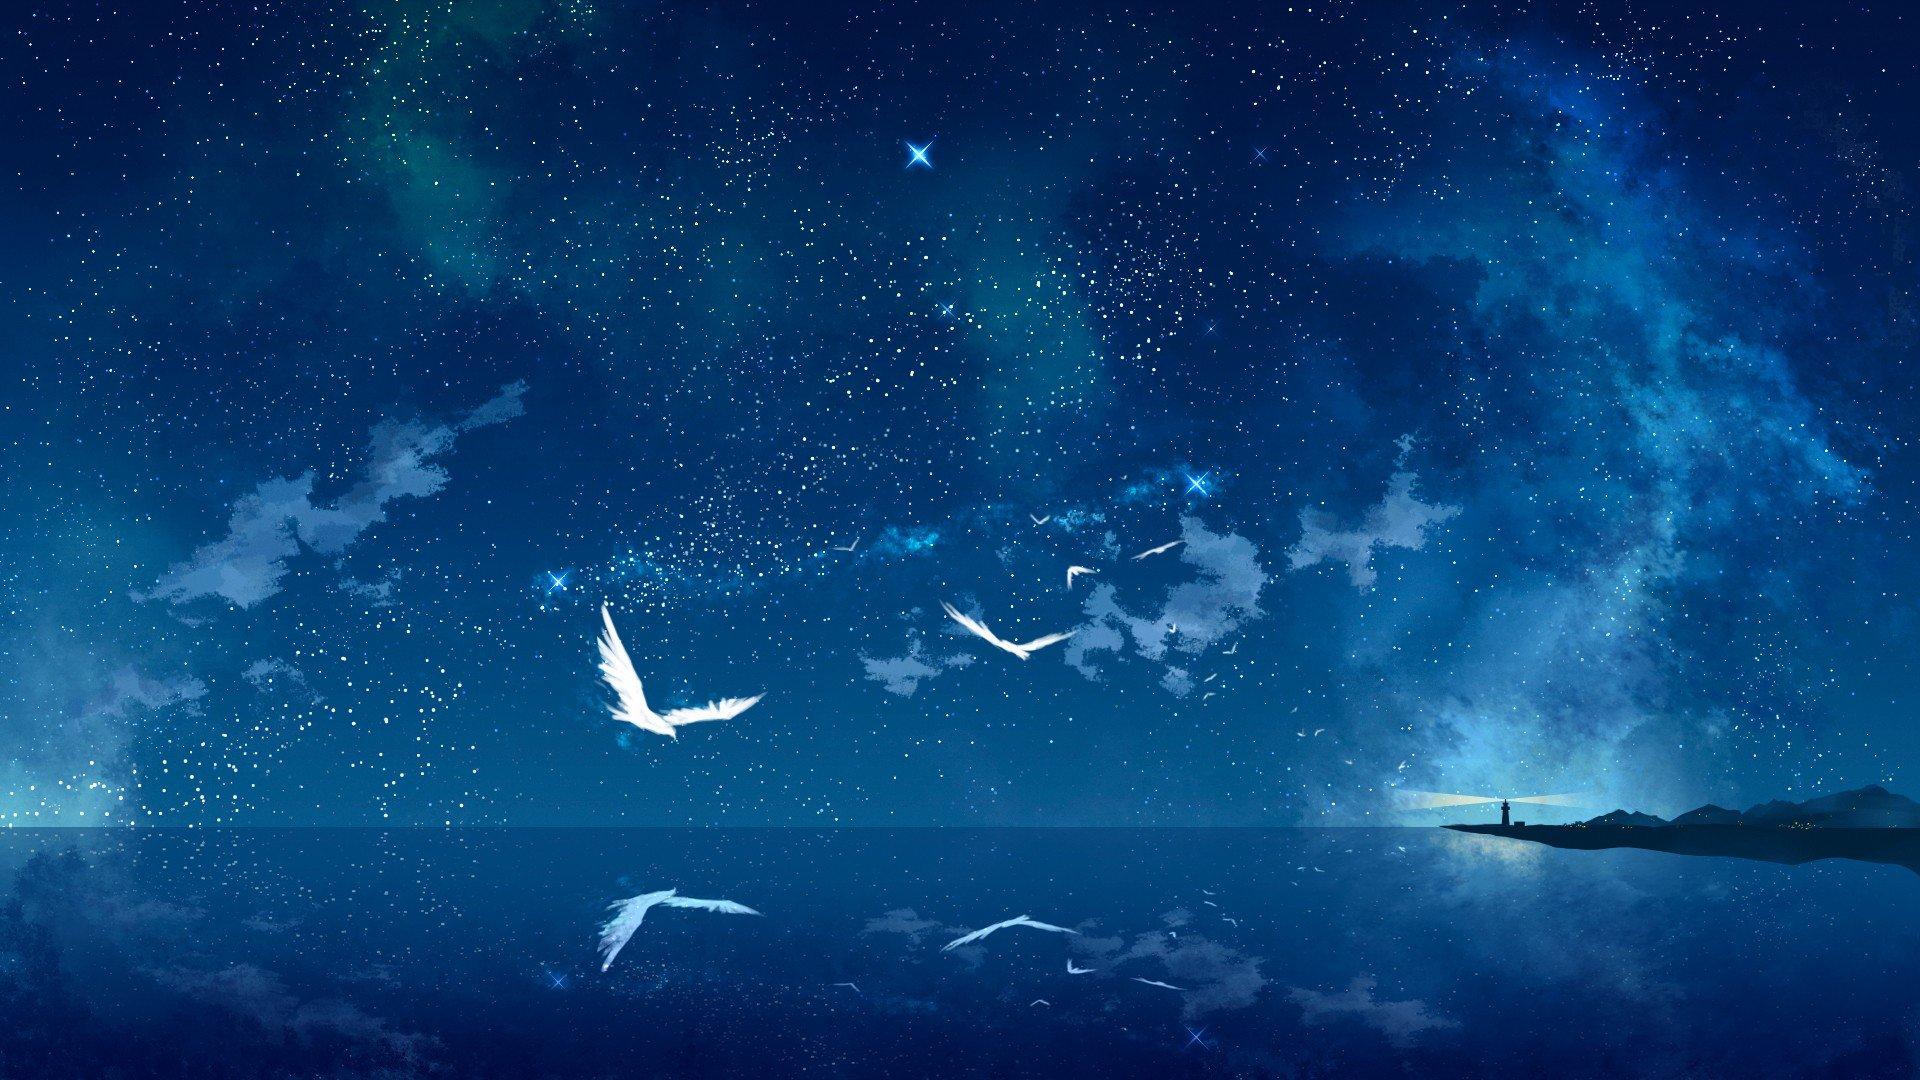 Gallery For gt Night Sky Wallpaper 1920x1080